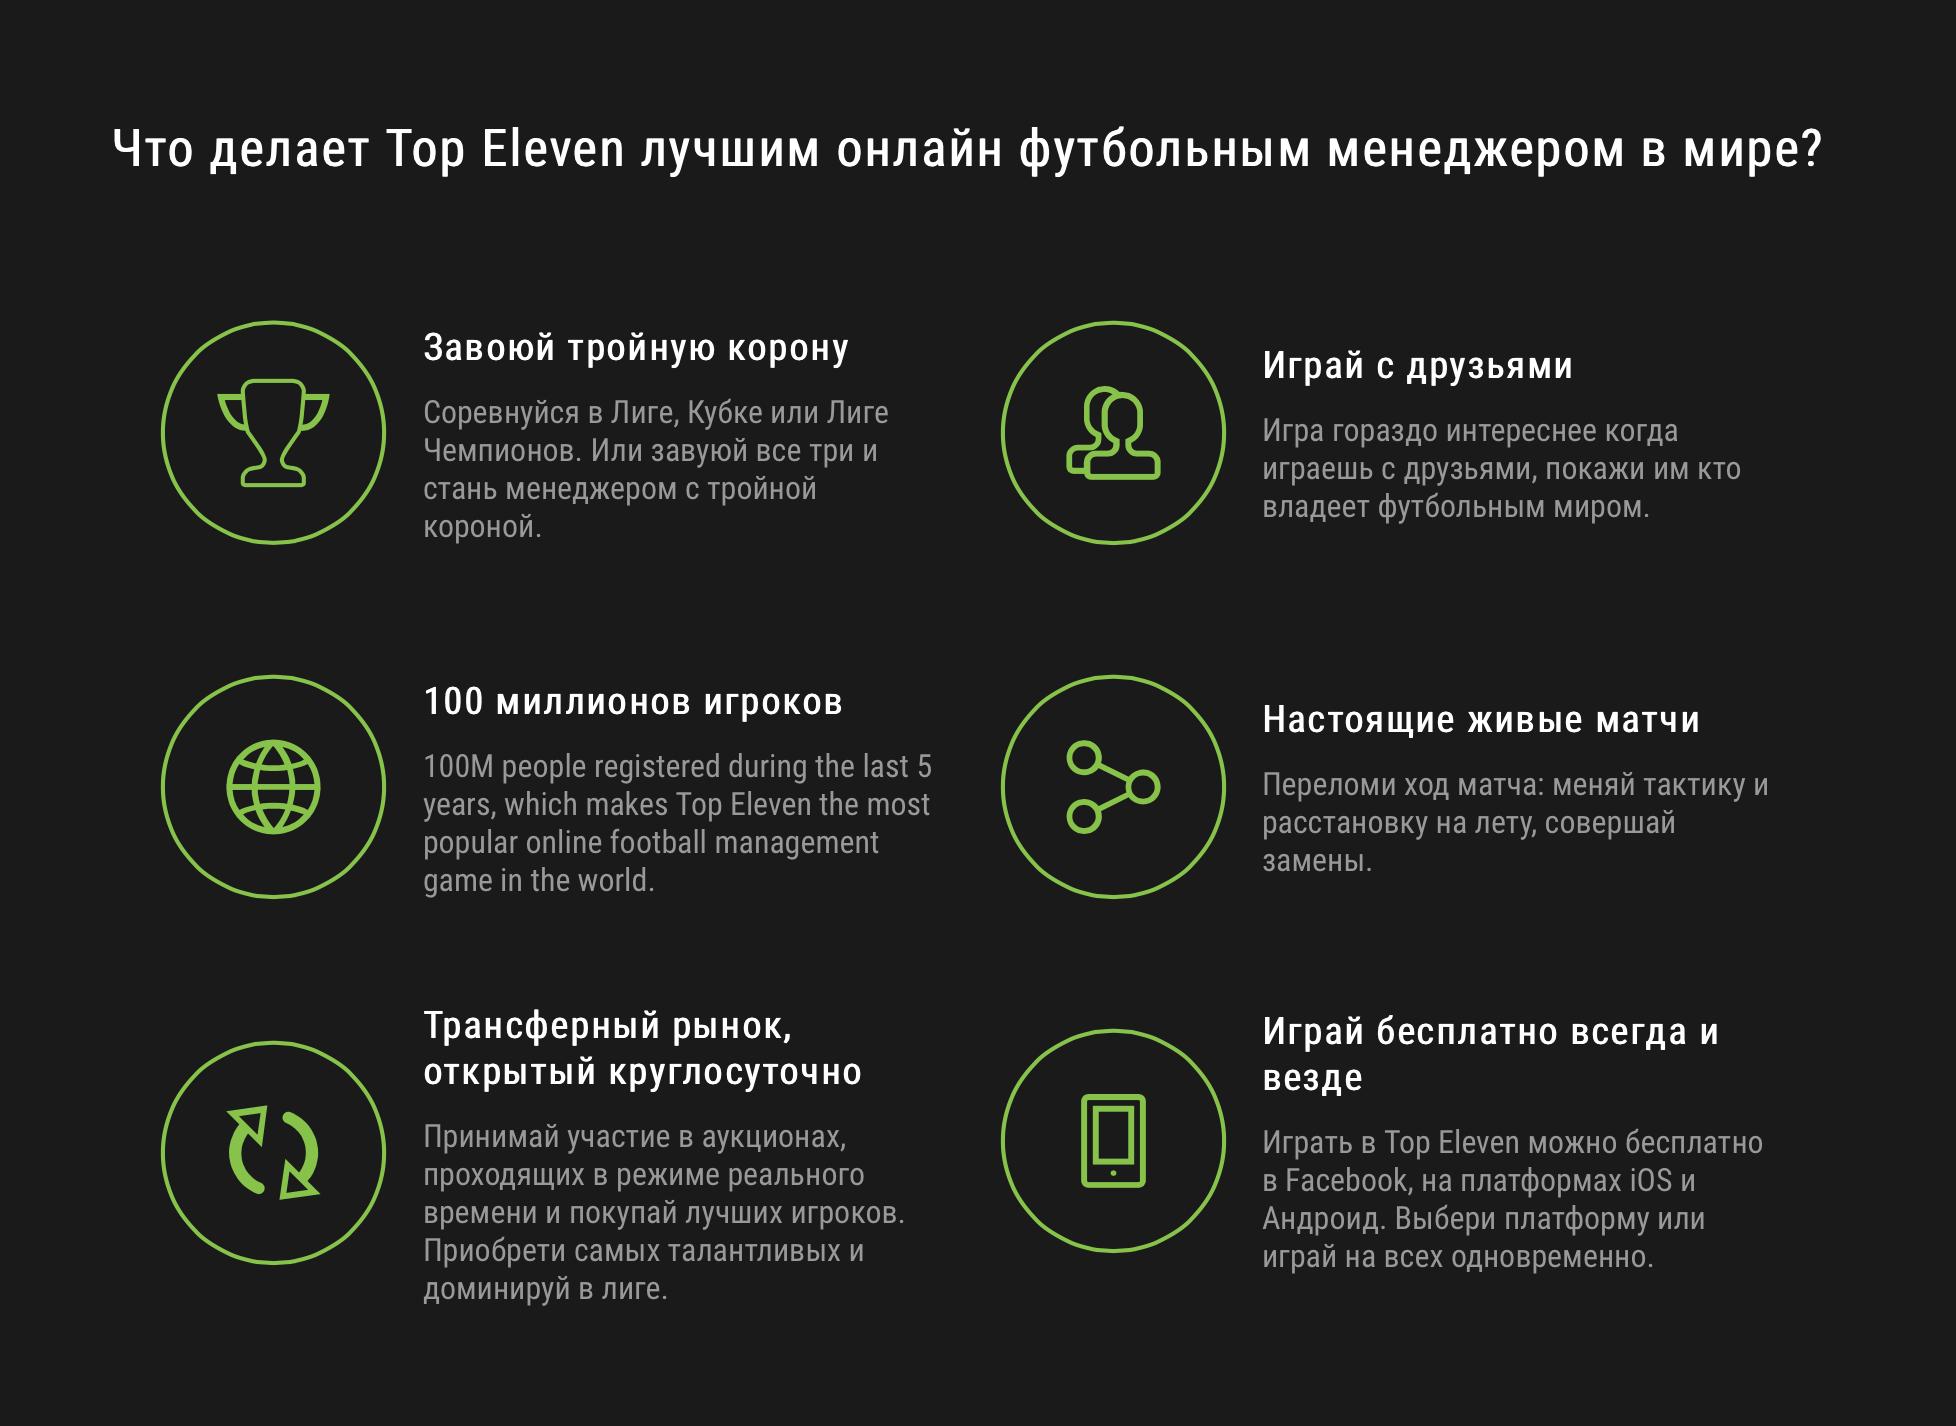 Top_Eleven_2015